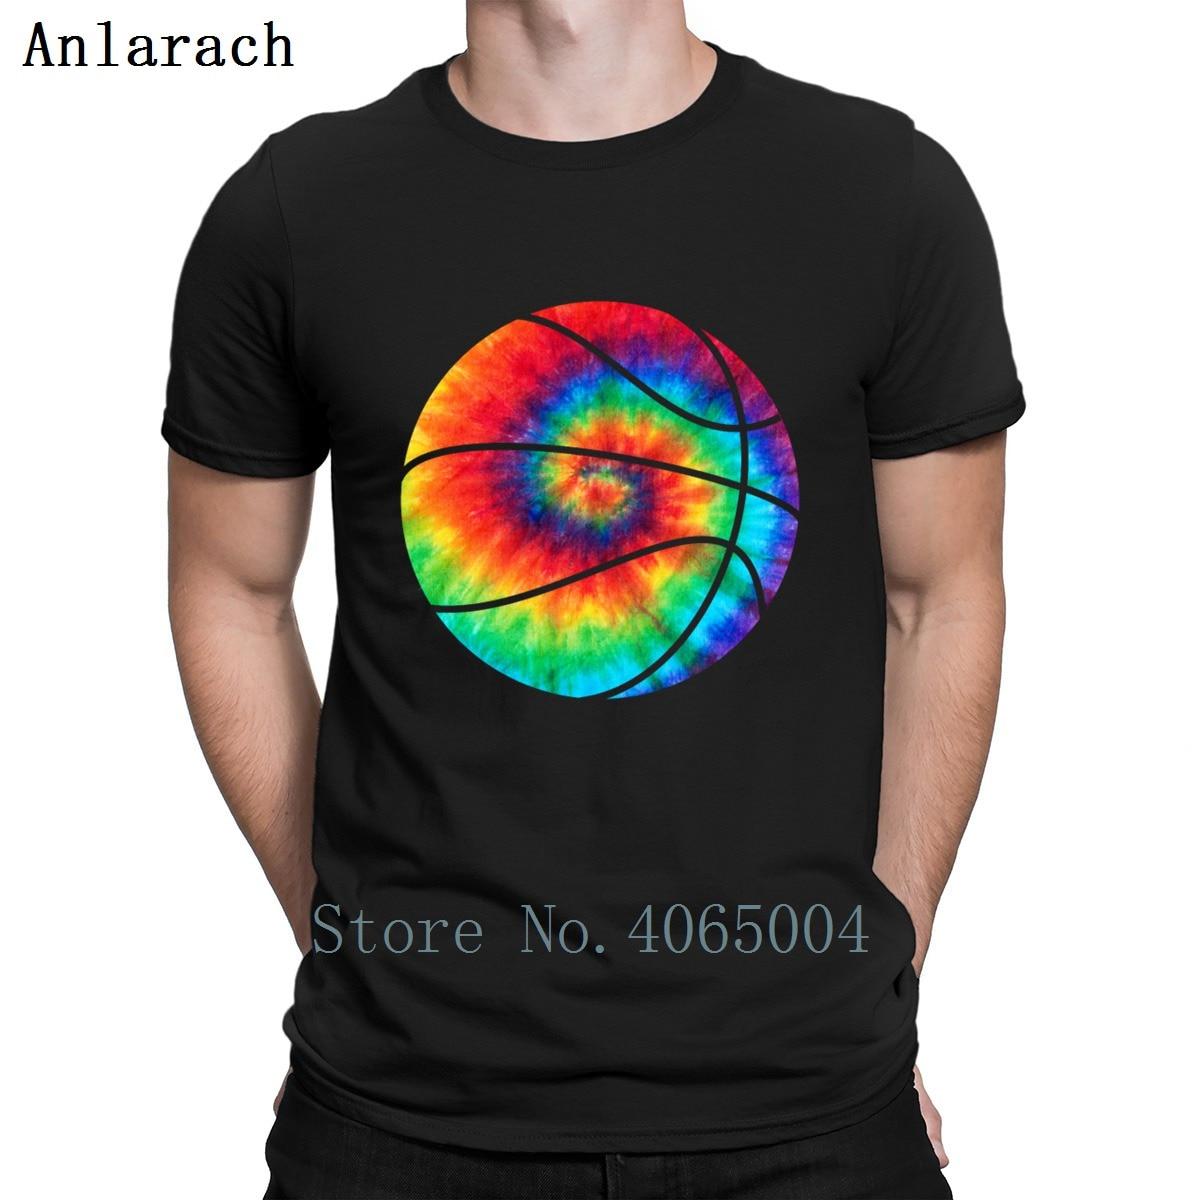 Basketball Tie Dye Rainbow Trippy Hippie T Shirt Cute Spring Print Tee Shirt Letters O Neck Vintage Authentic Shirt